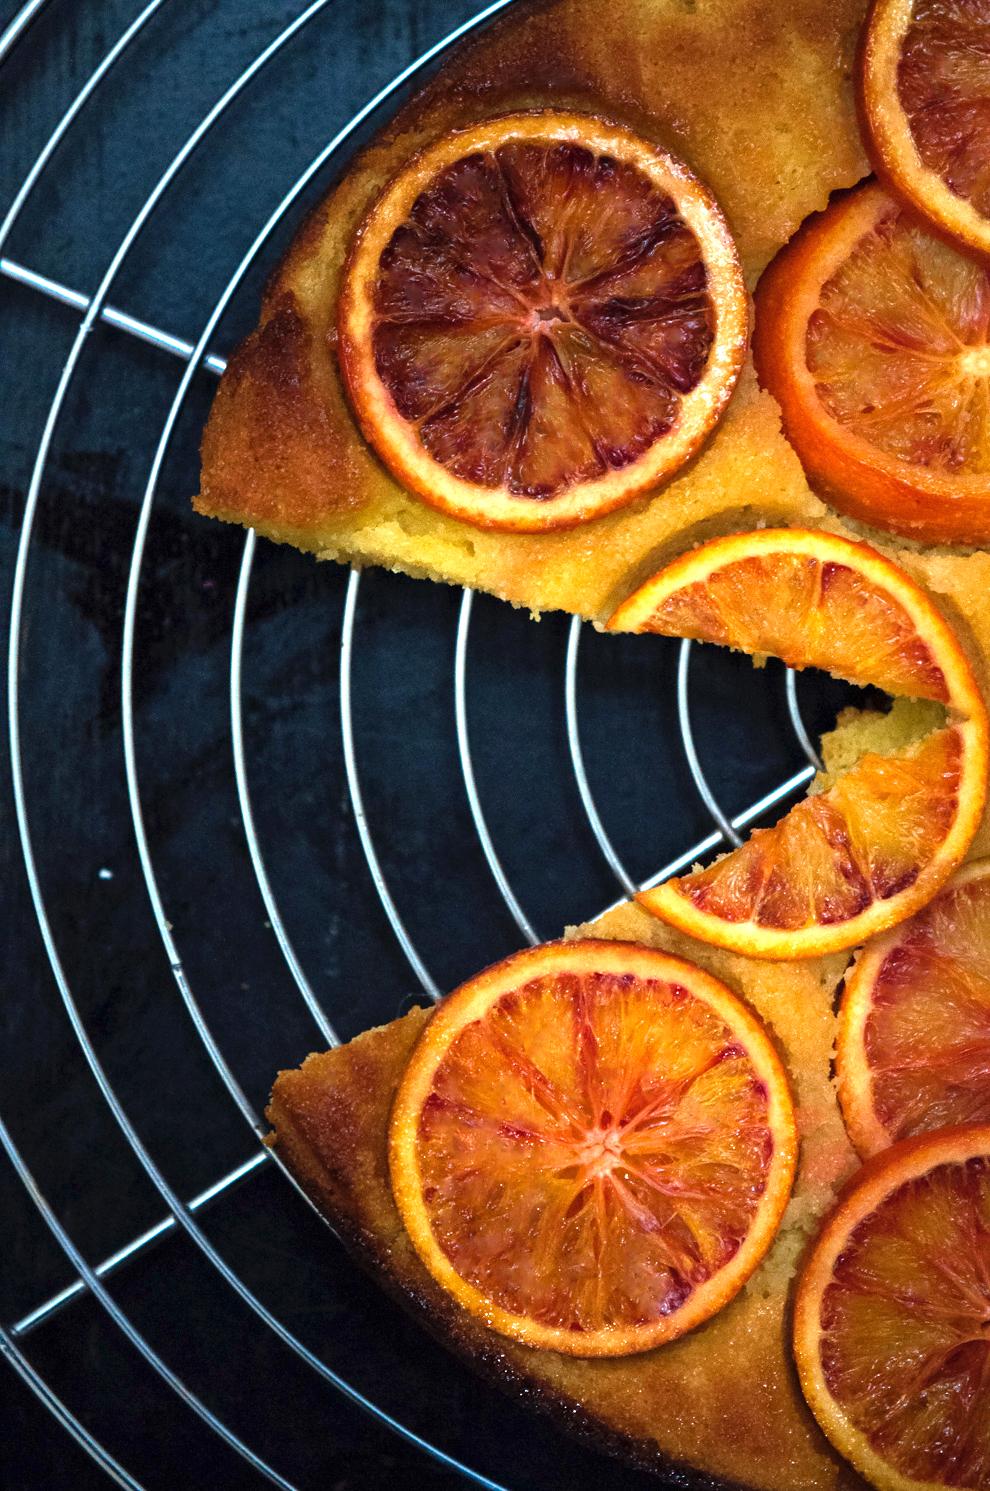 Blood orange, requeson and polenta cake | Monica R. Goya